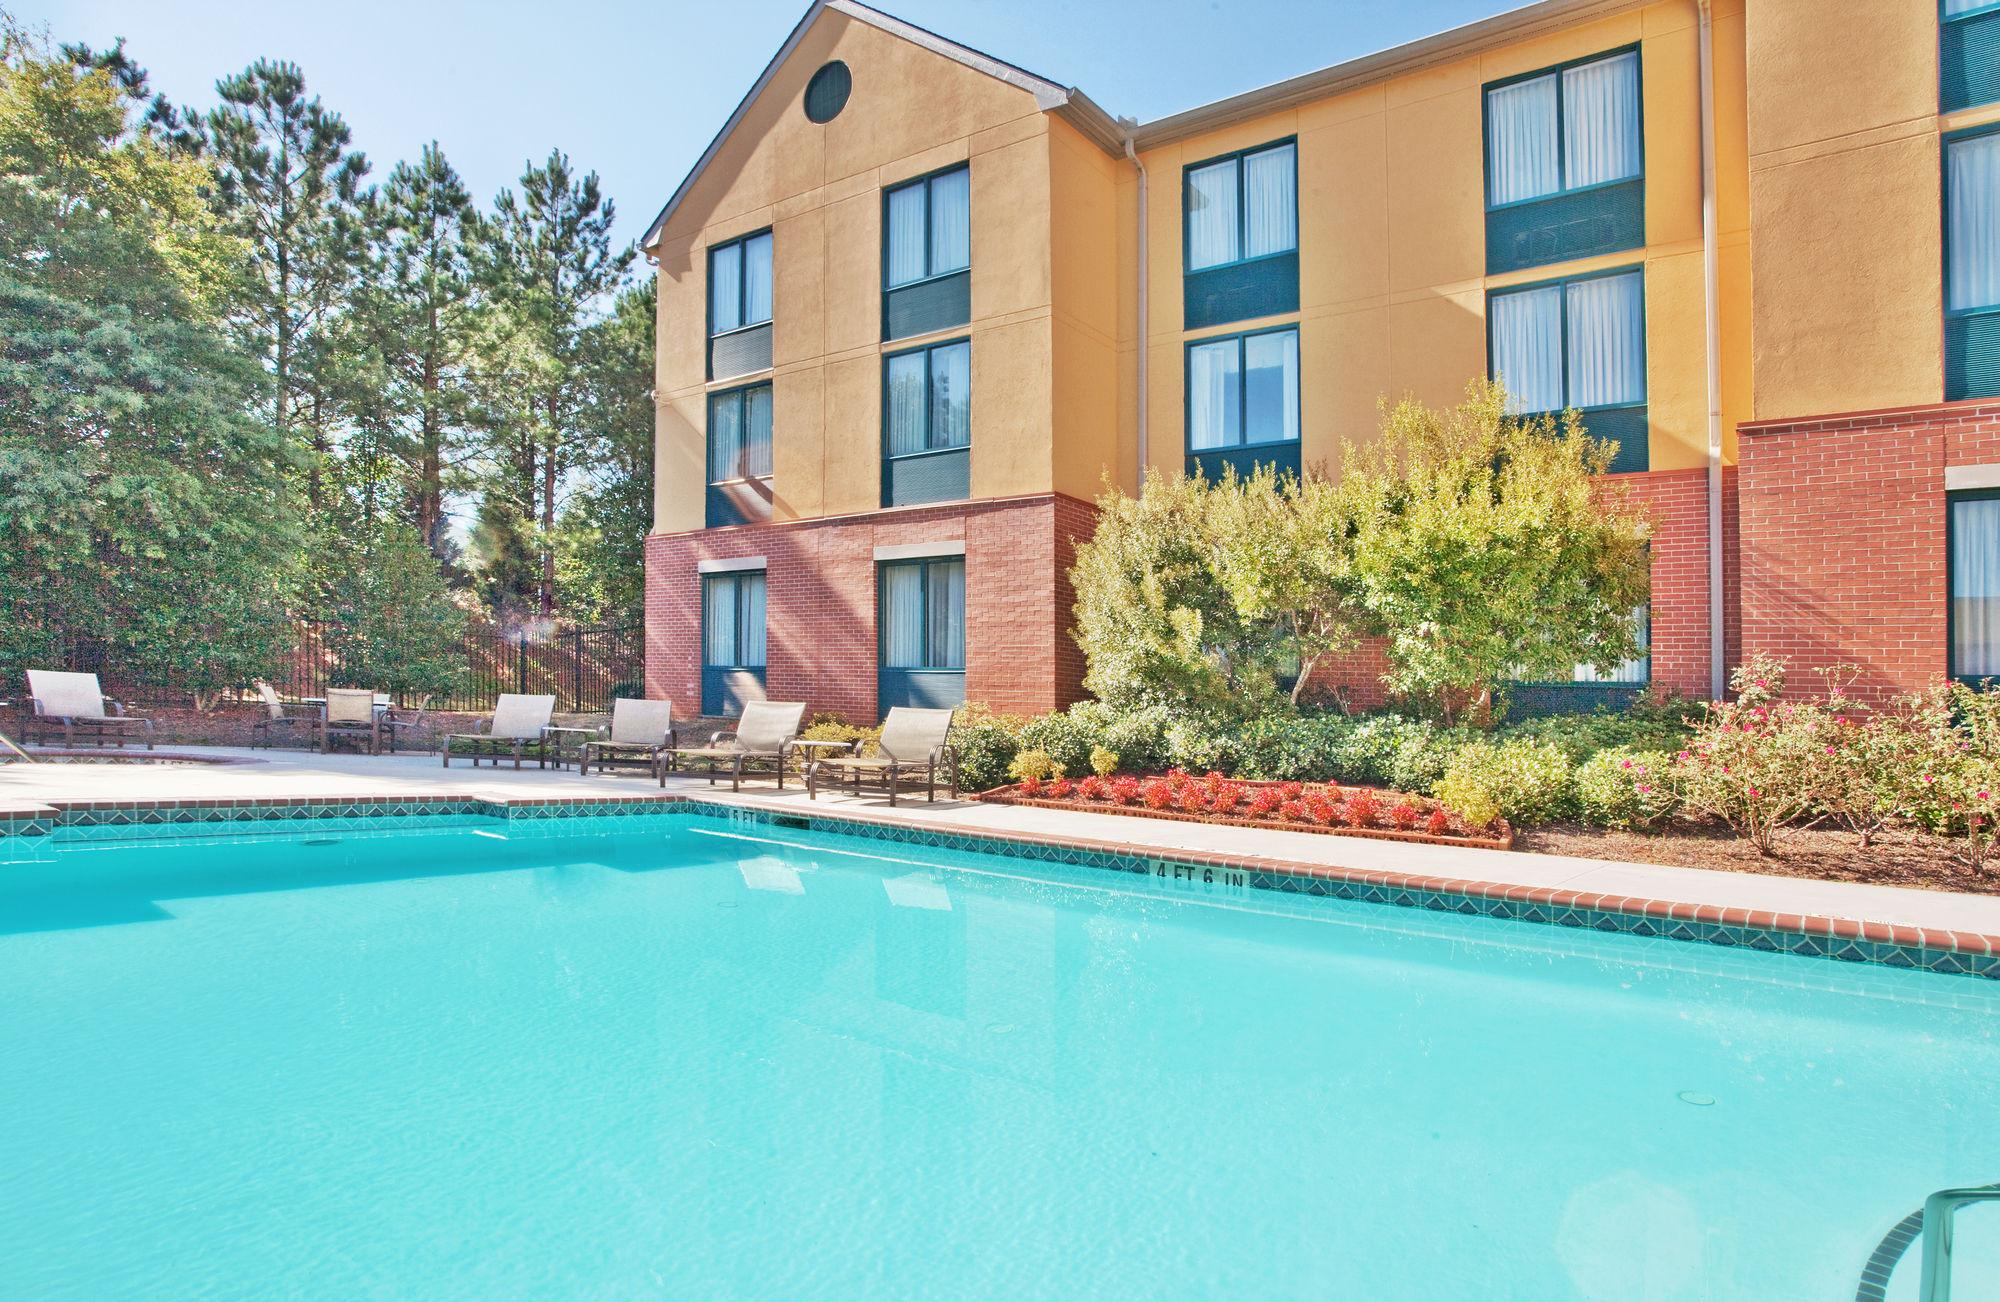 Holiday Inn Atlanta/Roswell in Roswell, GA